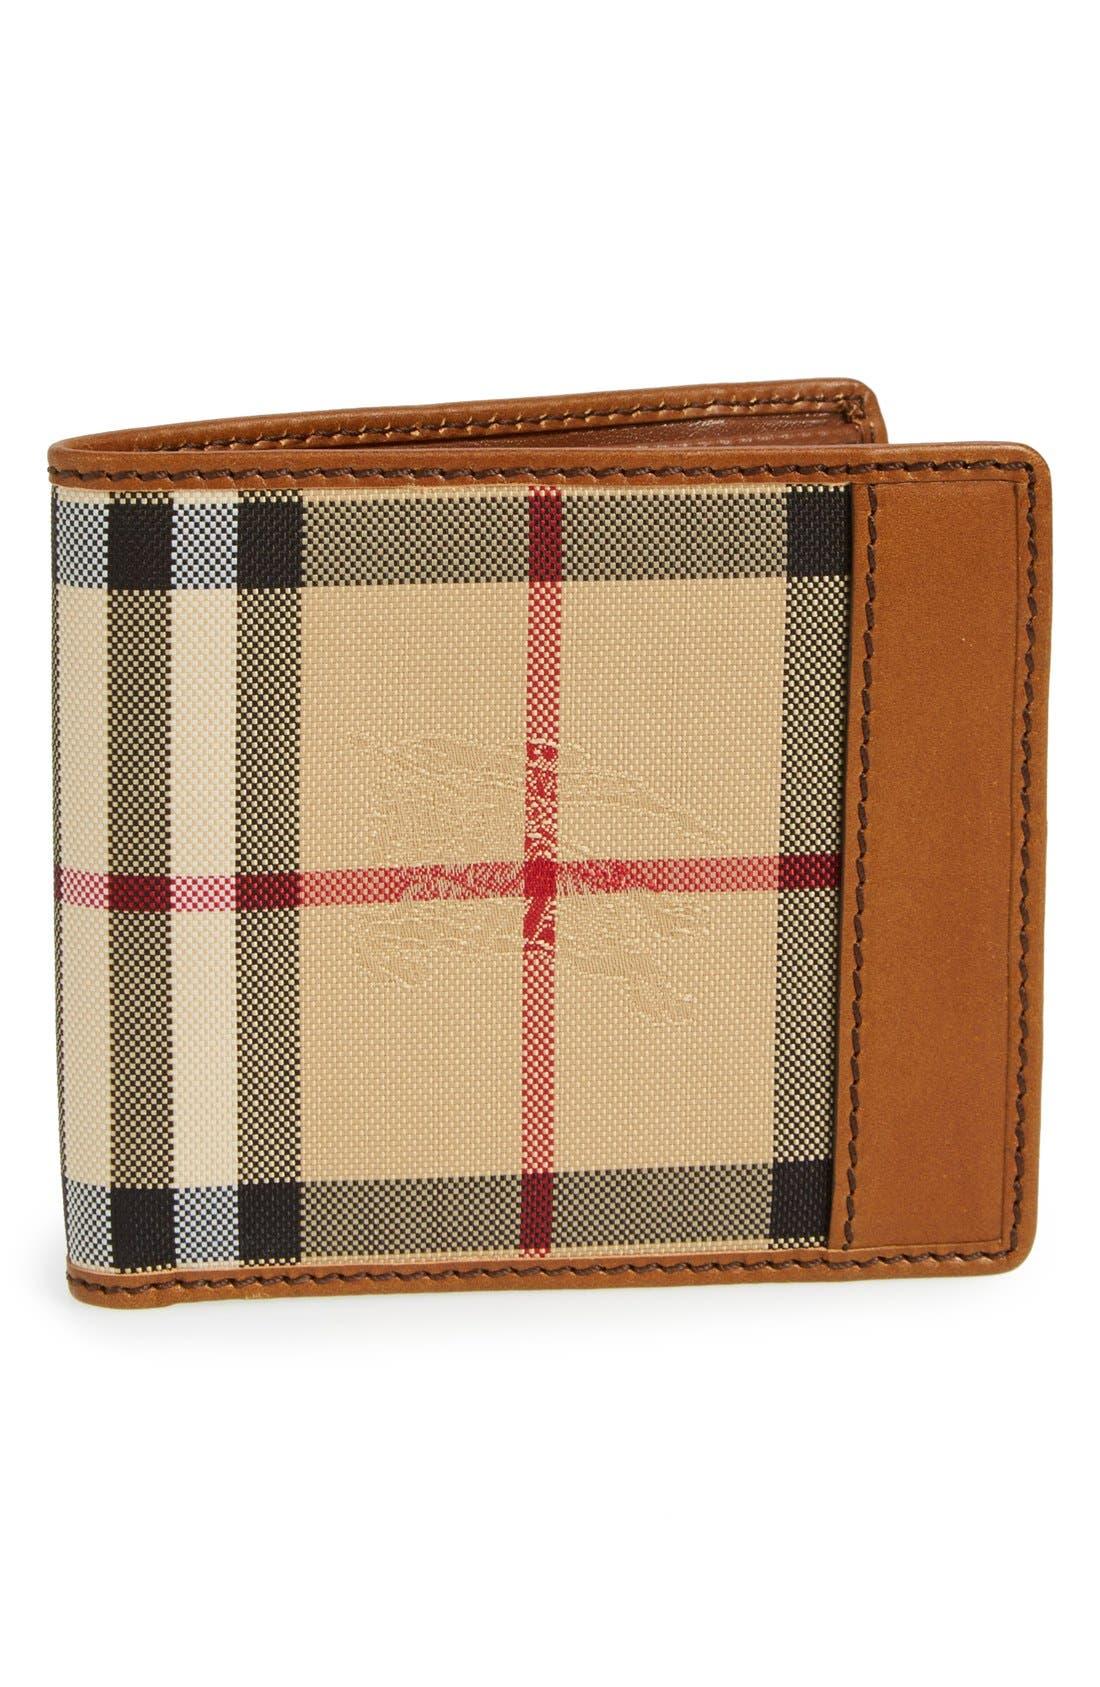 Burberry Horseferry Check Billfold Wallet